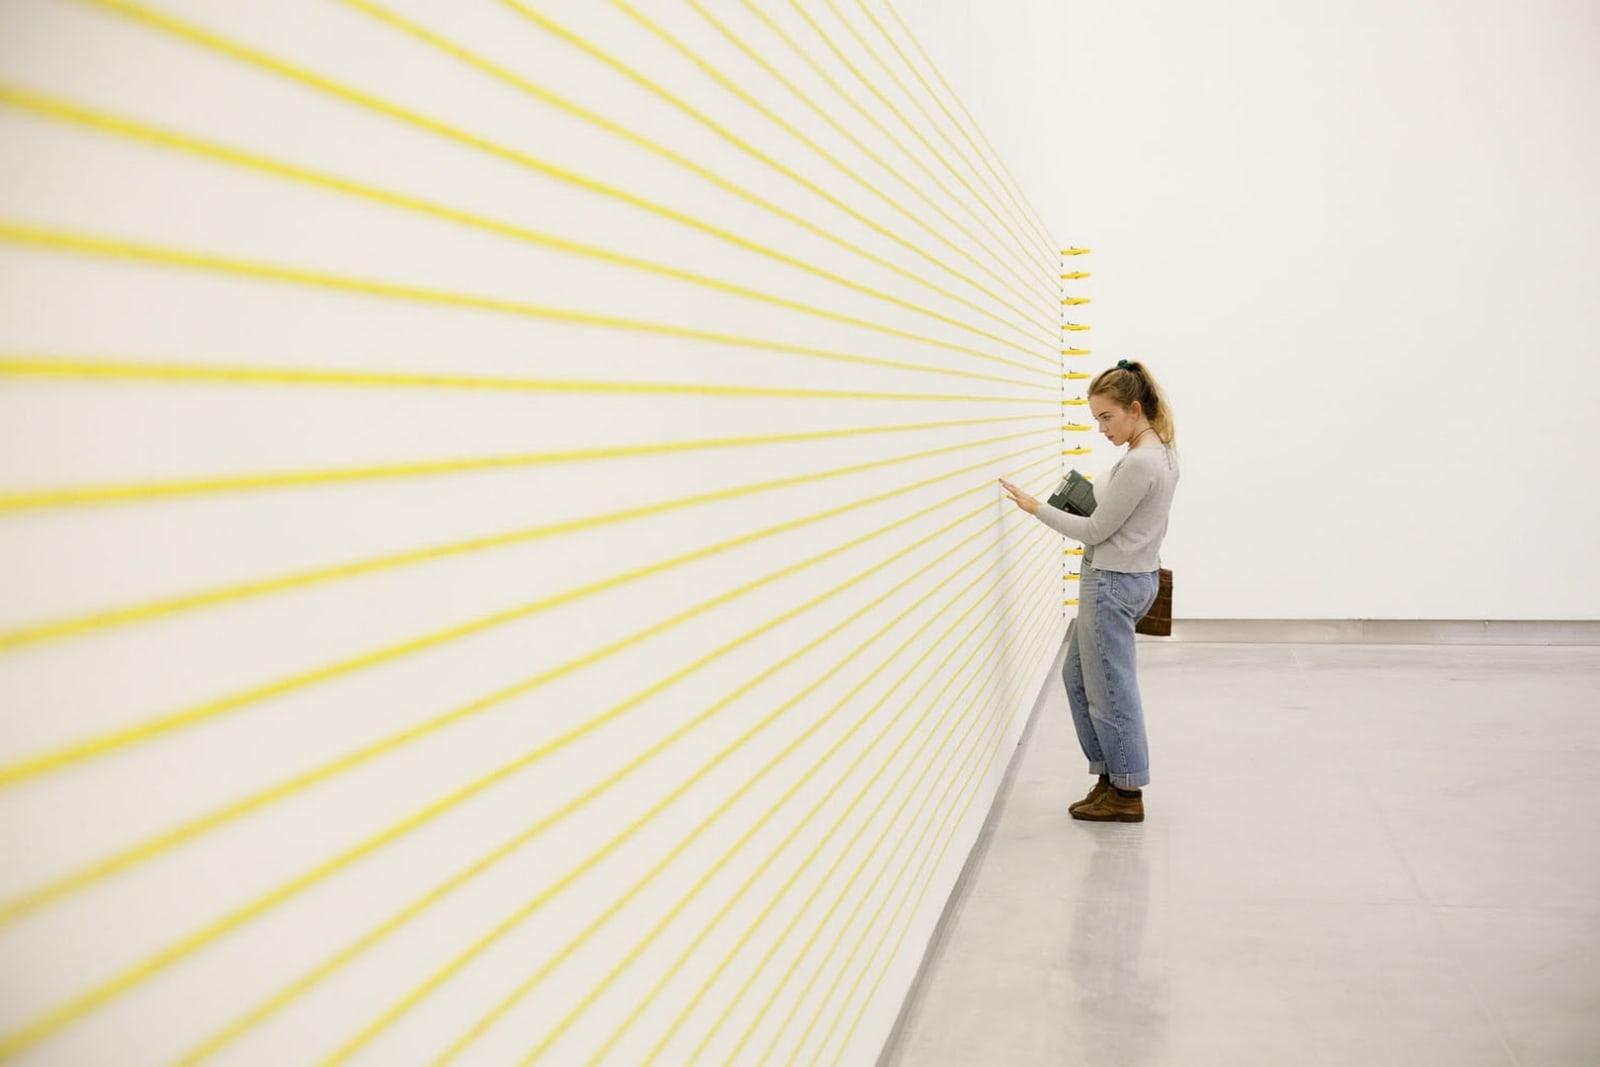 Jacob Dahlgren Units of Measurments South Dublin Art Centre, 2014